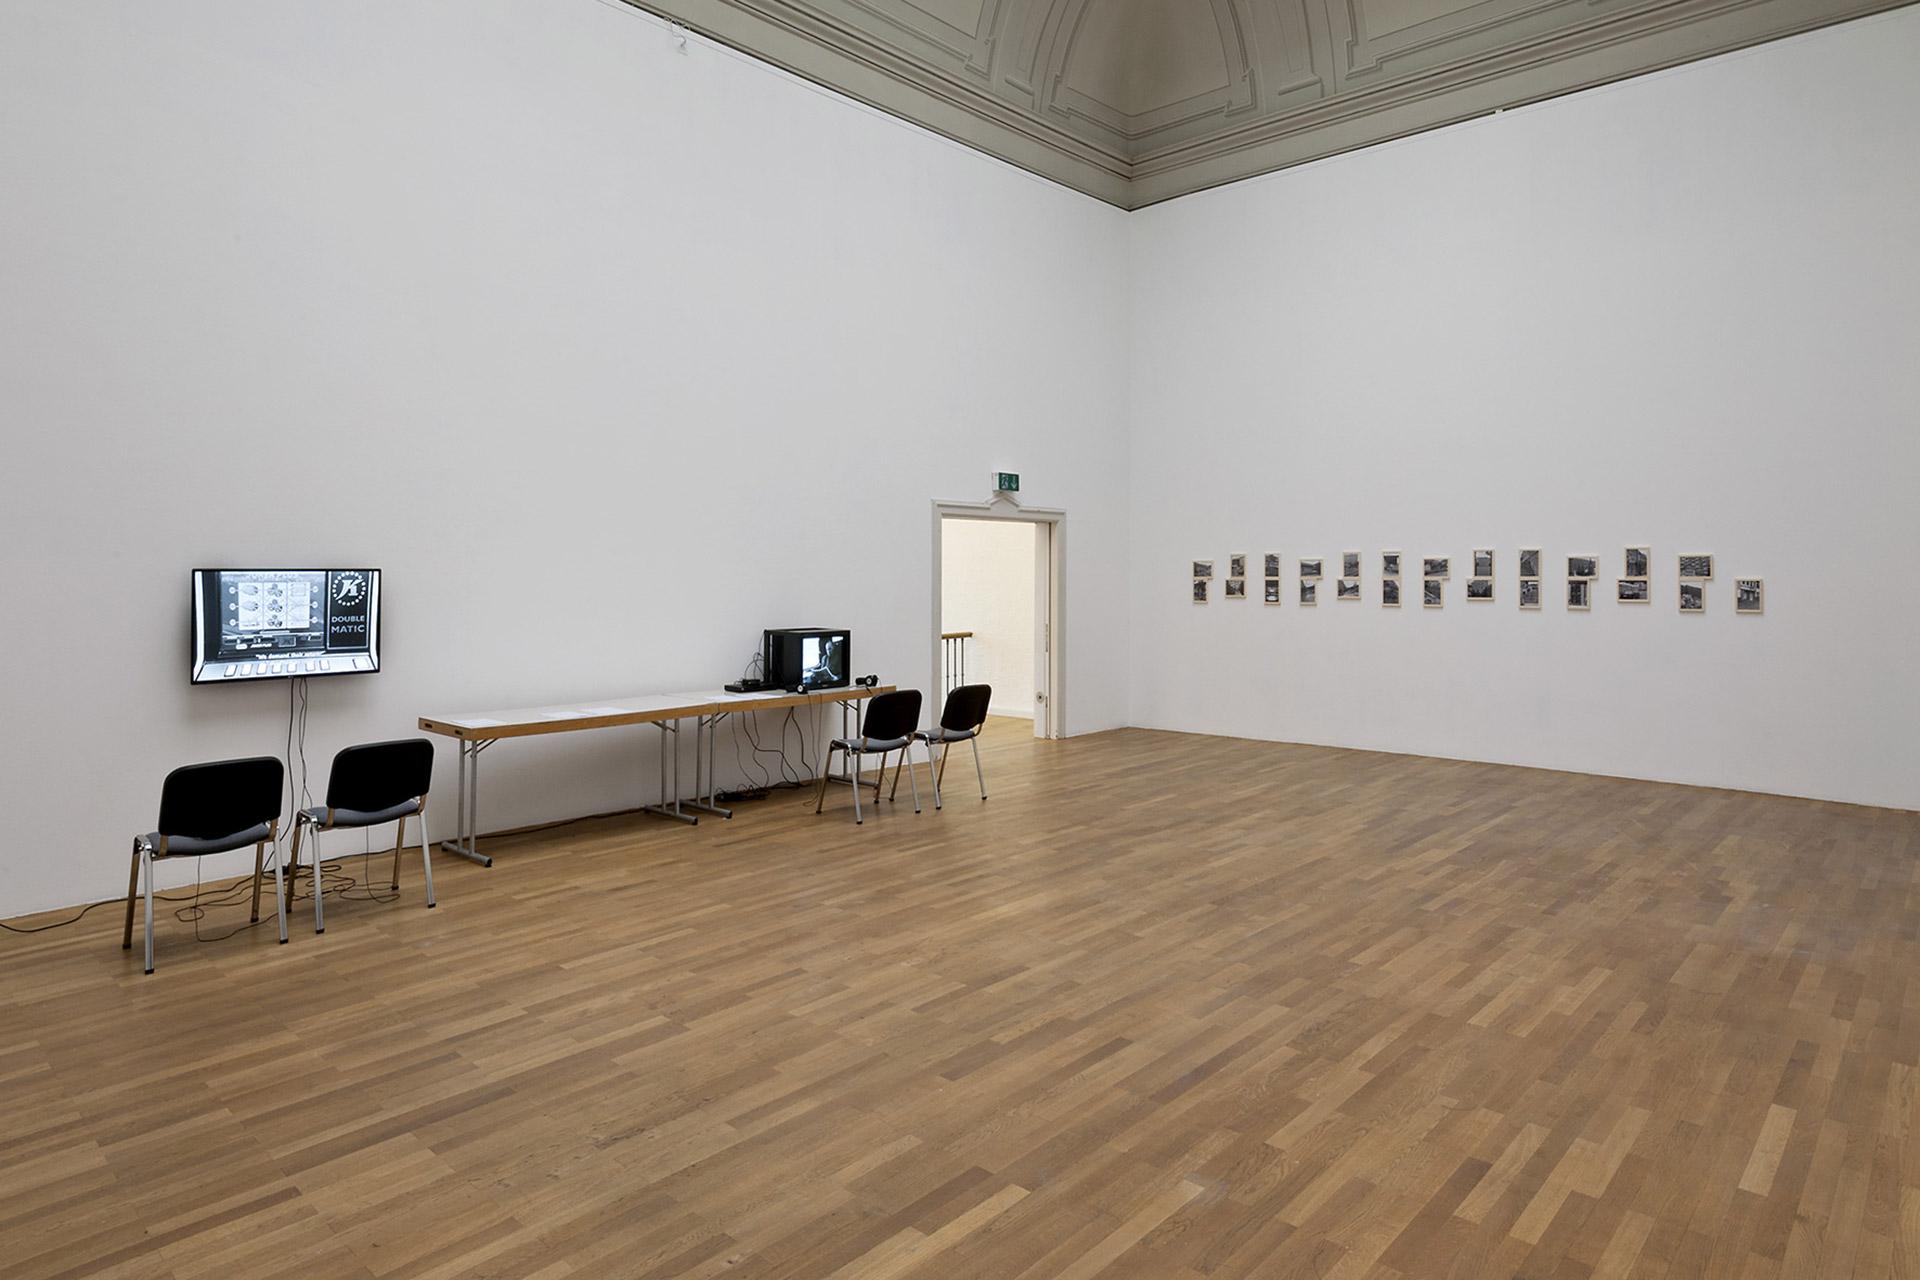 Kunsthalle-Winterthur-Josef-Dabernig-3.jpg